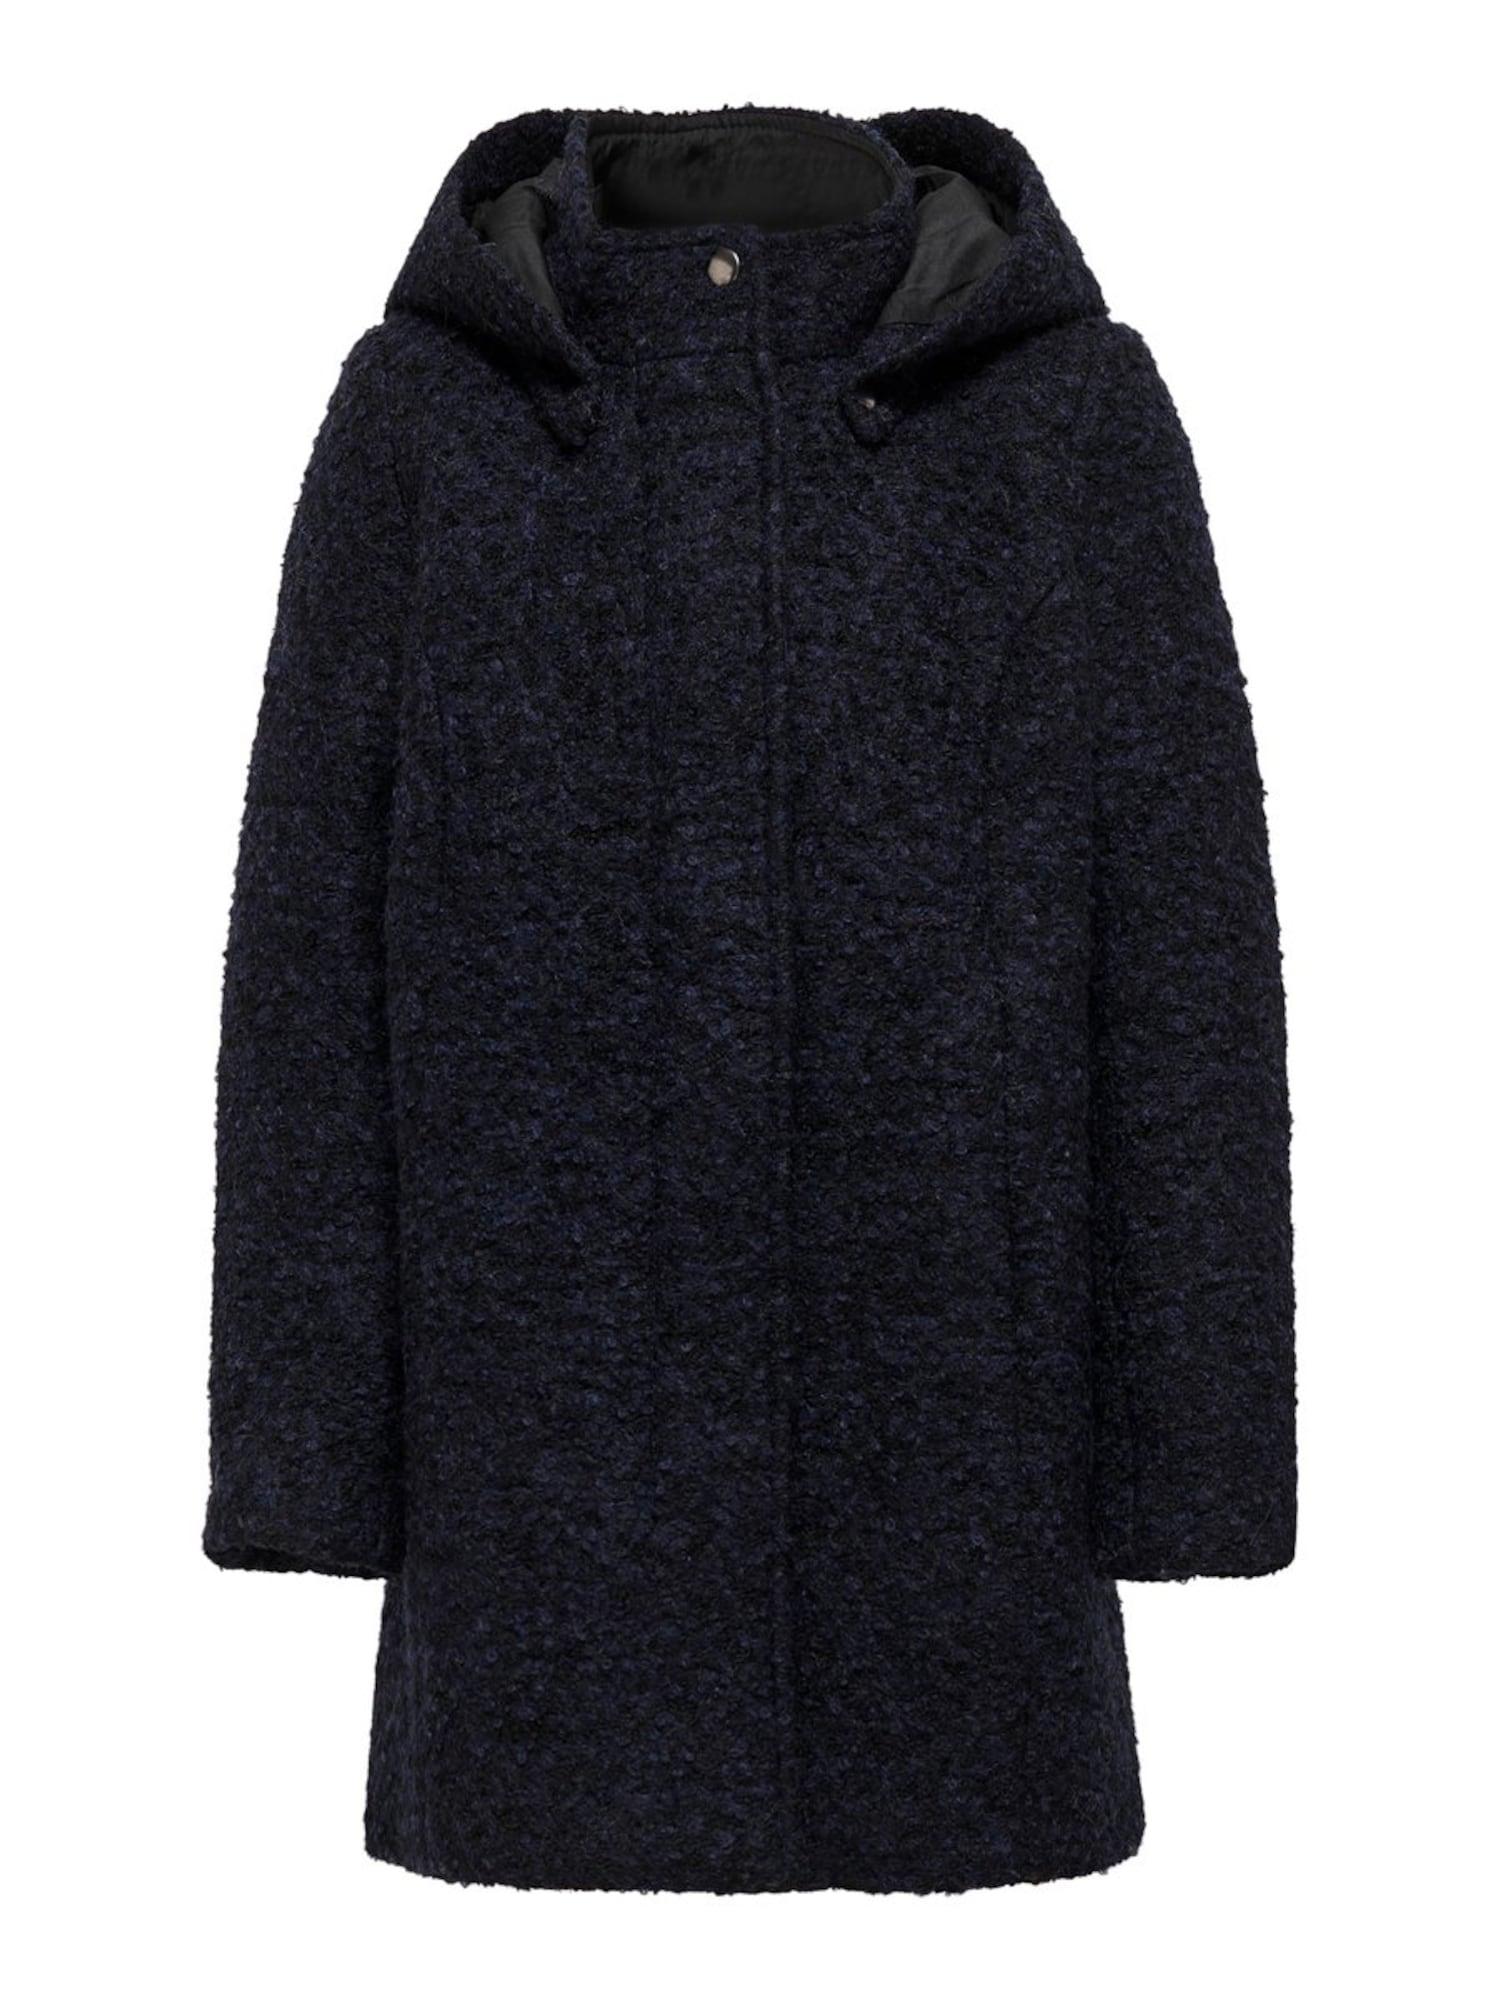 Kabát Sedona tmavě modrá KIDS ONLY